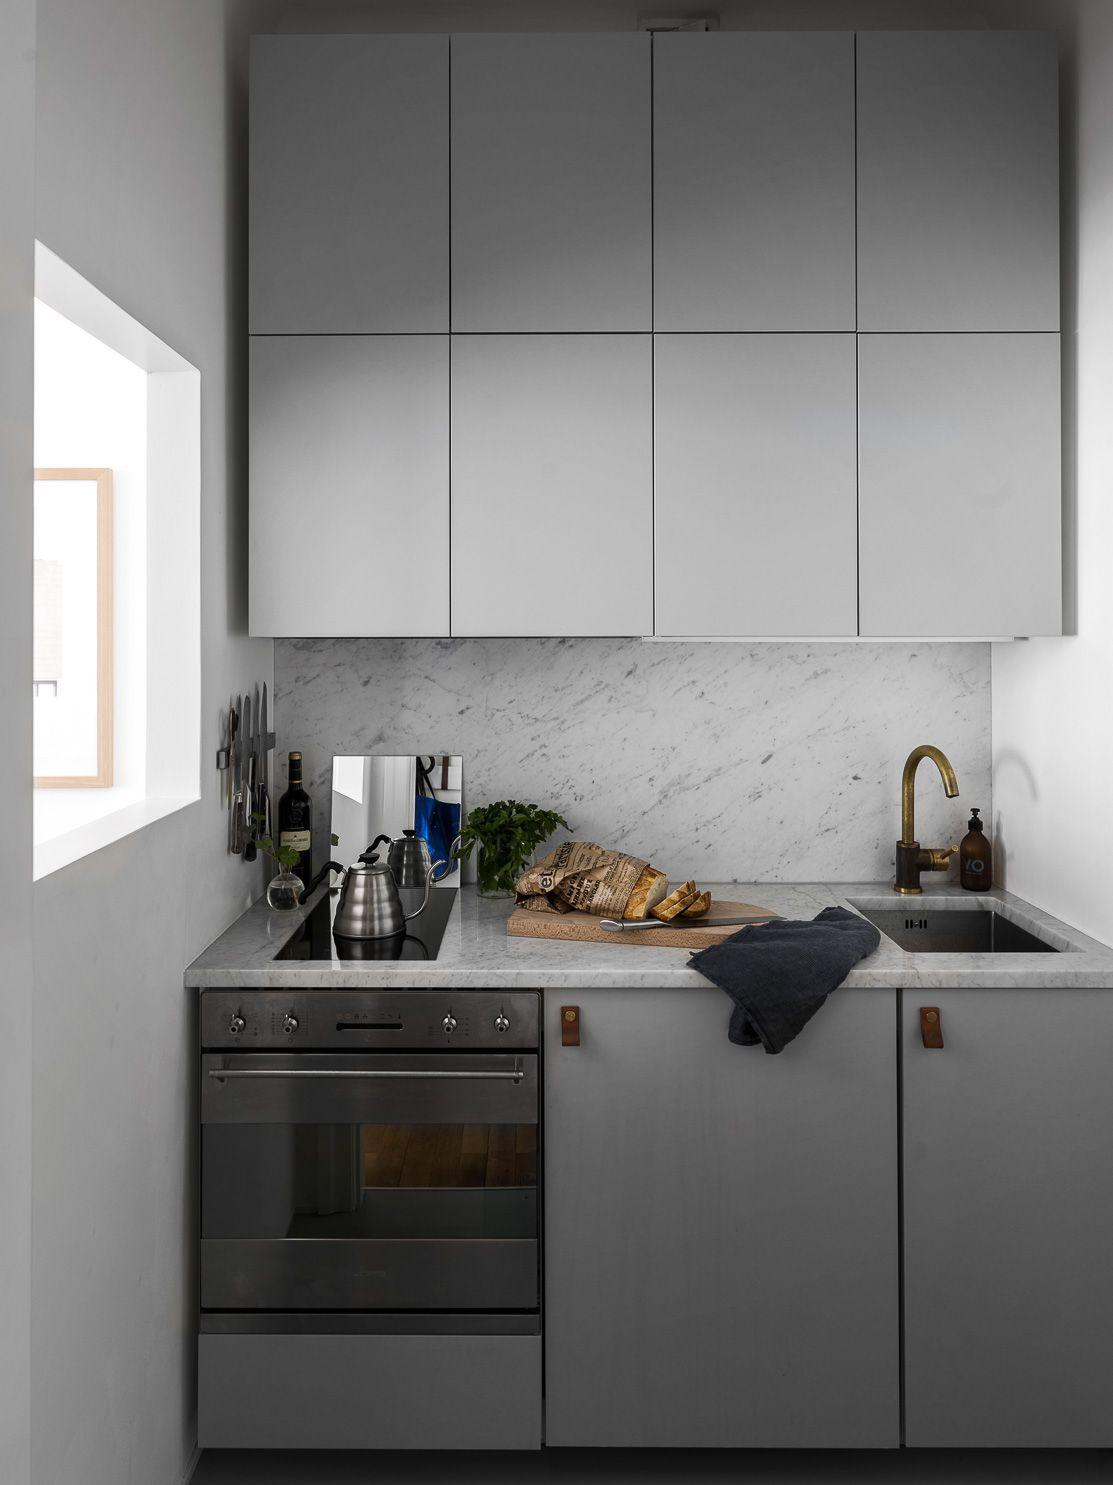 Cute This Small Kitchen  Keittiö  Vaaleanharmaa  Pinterest Entrancing Small Kitchen Interior Design Review